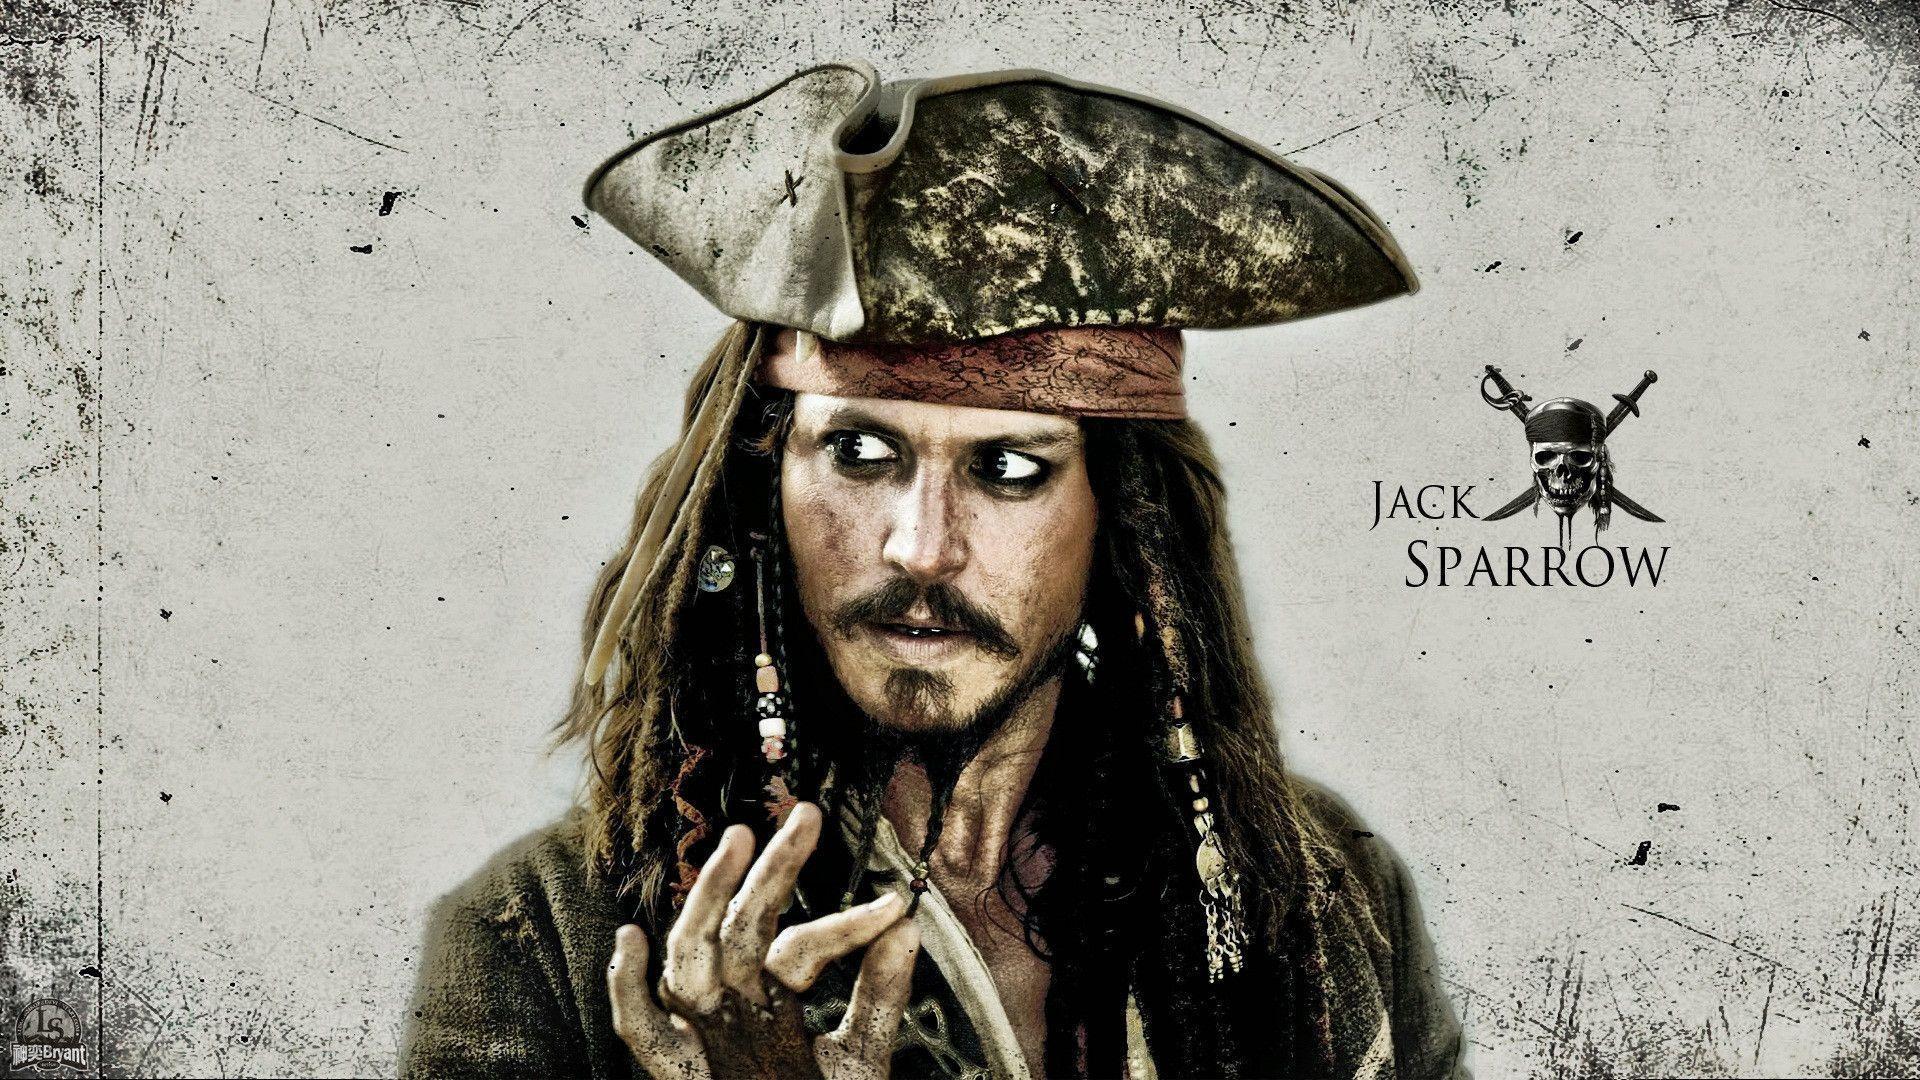 Captian Jack Sparrow Wallpapers Top Free Captian Jack Sparrow Backgrounds Wallpaperaccess